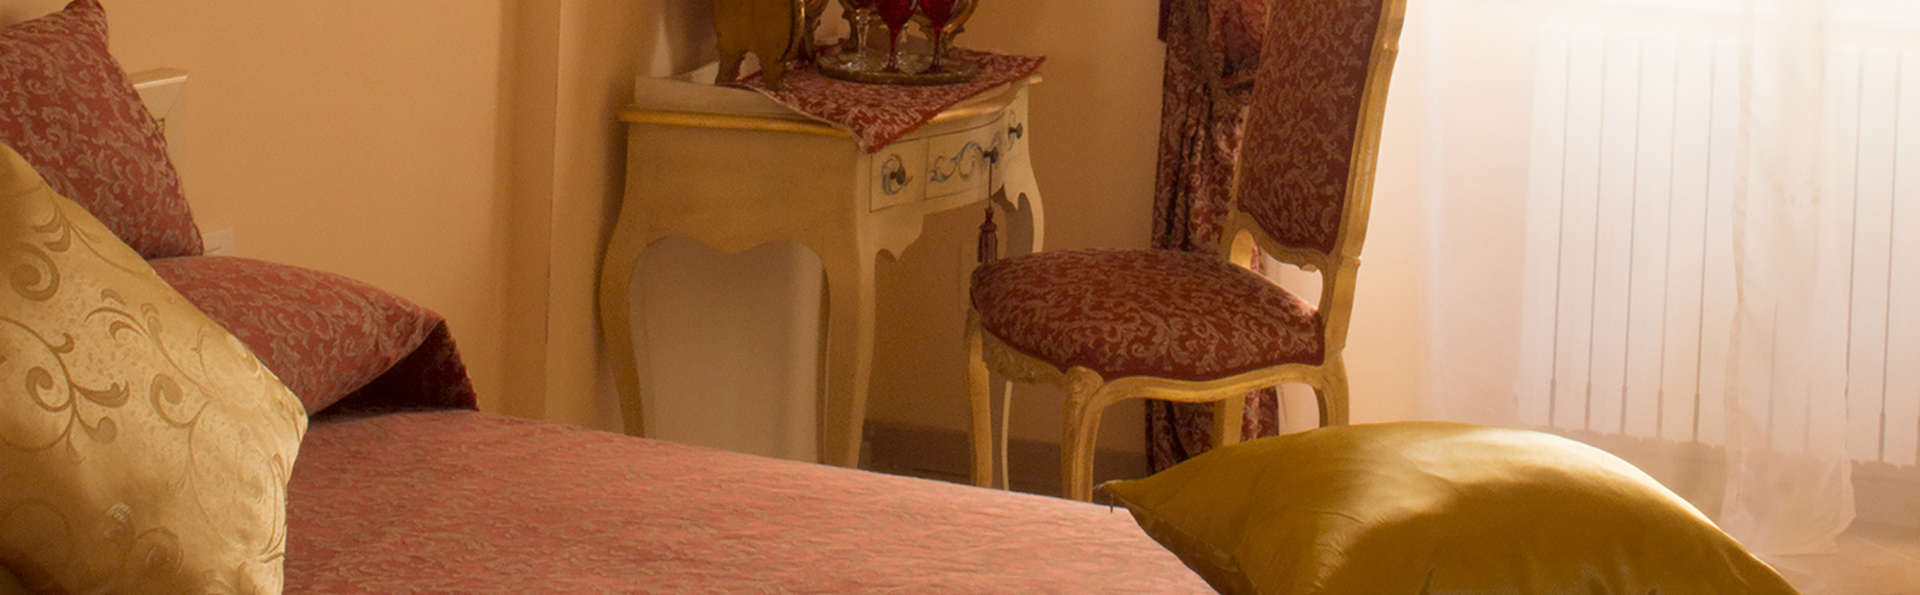 Residenza d'Epoca La Corte Dei Principi - Edit_New_Room.jpg